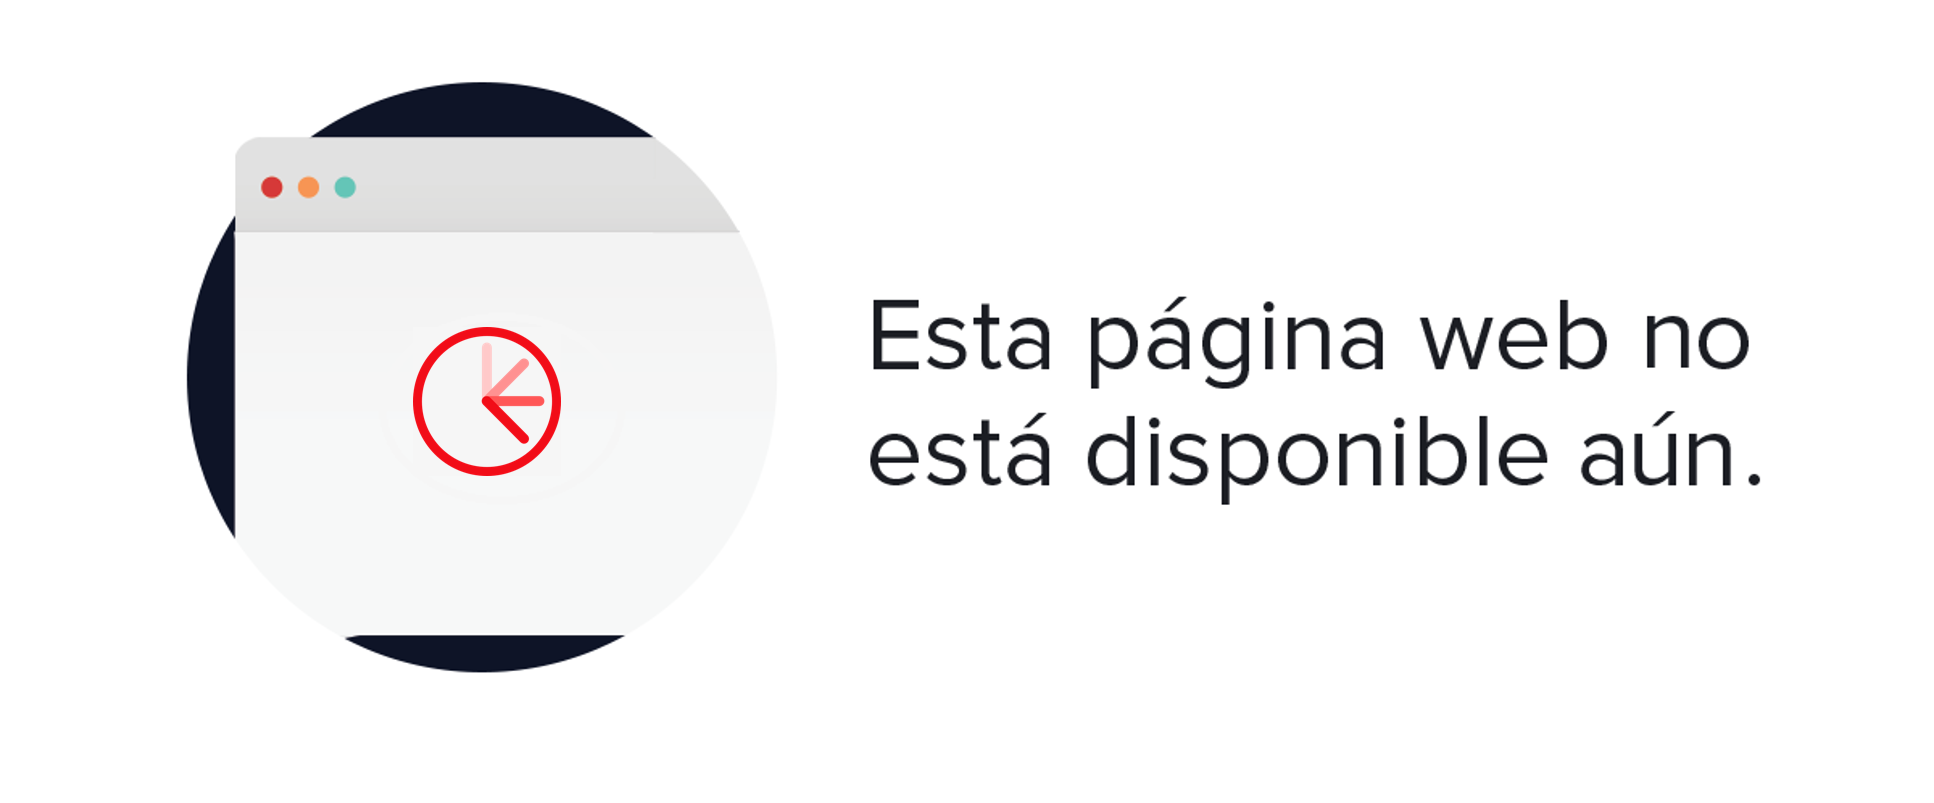 Easy Wear - Pantalón recto de mujer Easy Wear con cremalleras Negro 001041572101545036 - WTYCSZD